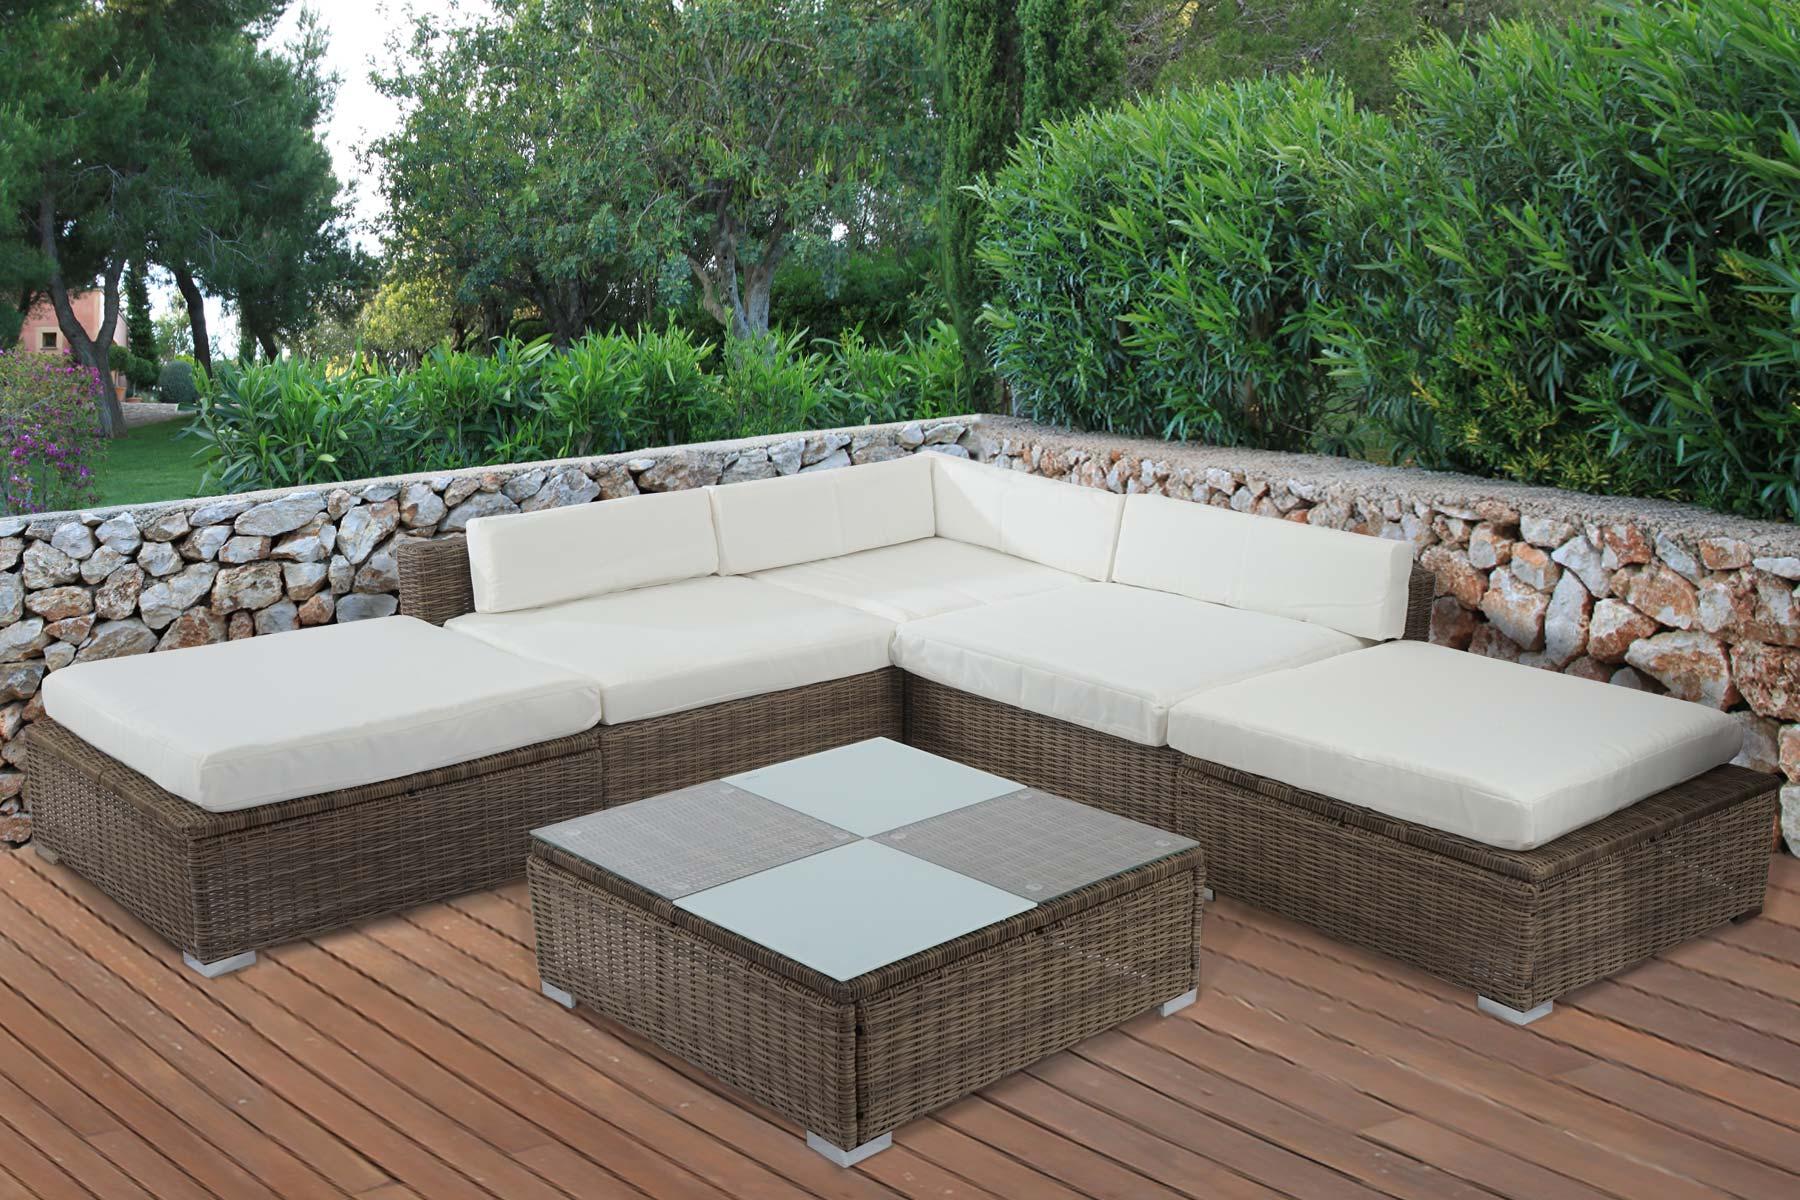 Good Rattan Sofa Garten Balkonmbel Rattan Sessel Gartenmbel Polyrattan  Online Kaufen With Garten Balkonmbel